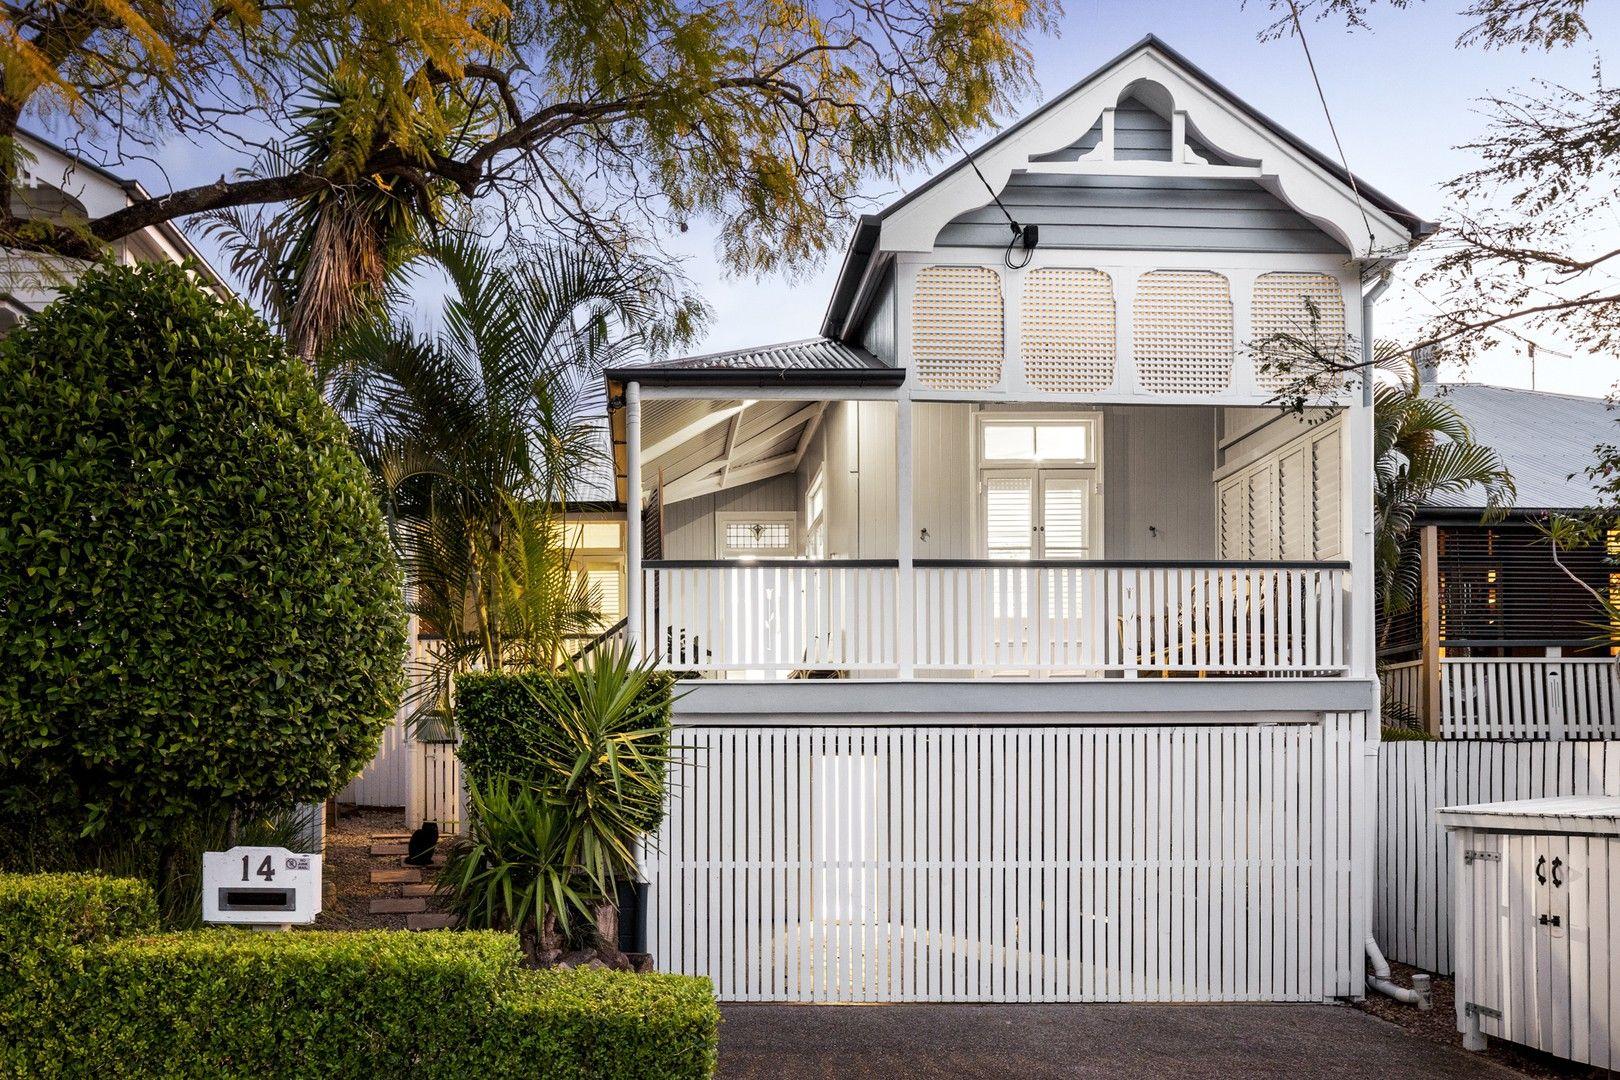 14 Bangalla Street, Auchenflower QLD 4066, Image 0